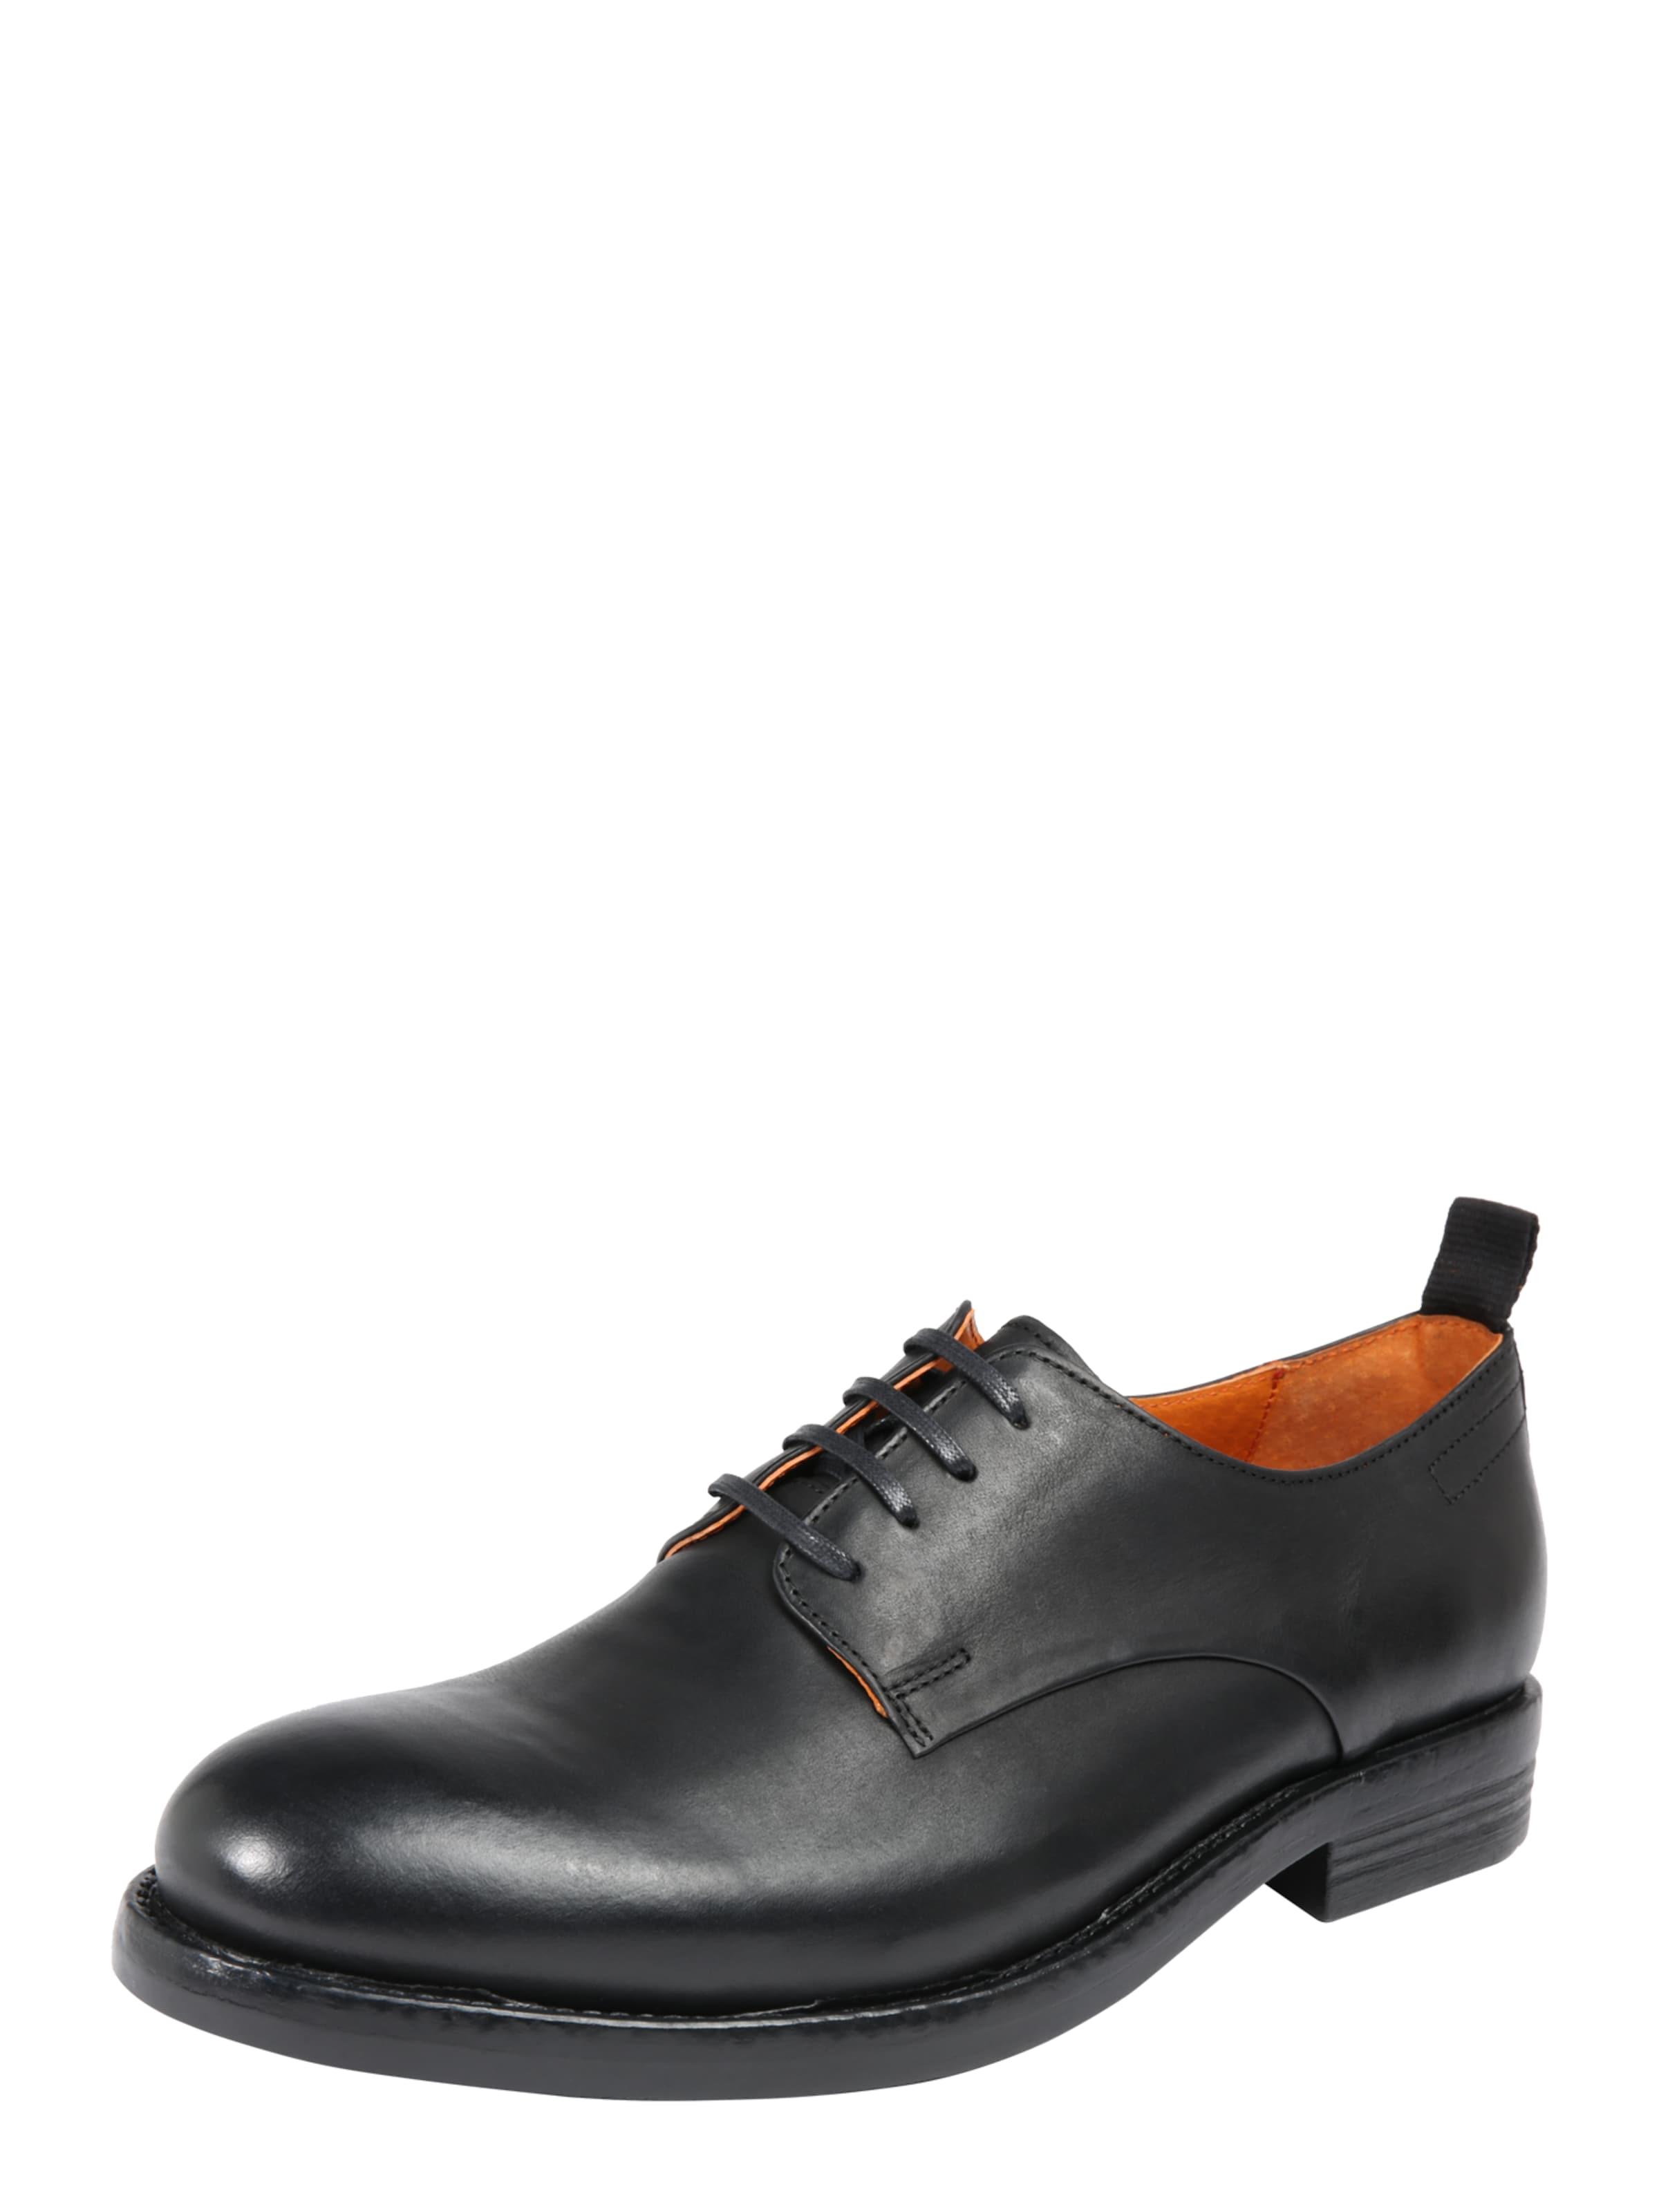 Schuhe In Dunkelbraun In Dunkelbraun Schuhe Bianco 'ace' Bianco Schuhe Bianco 'ace' WE2IDH9eY